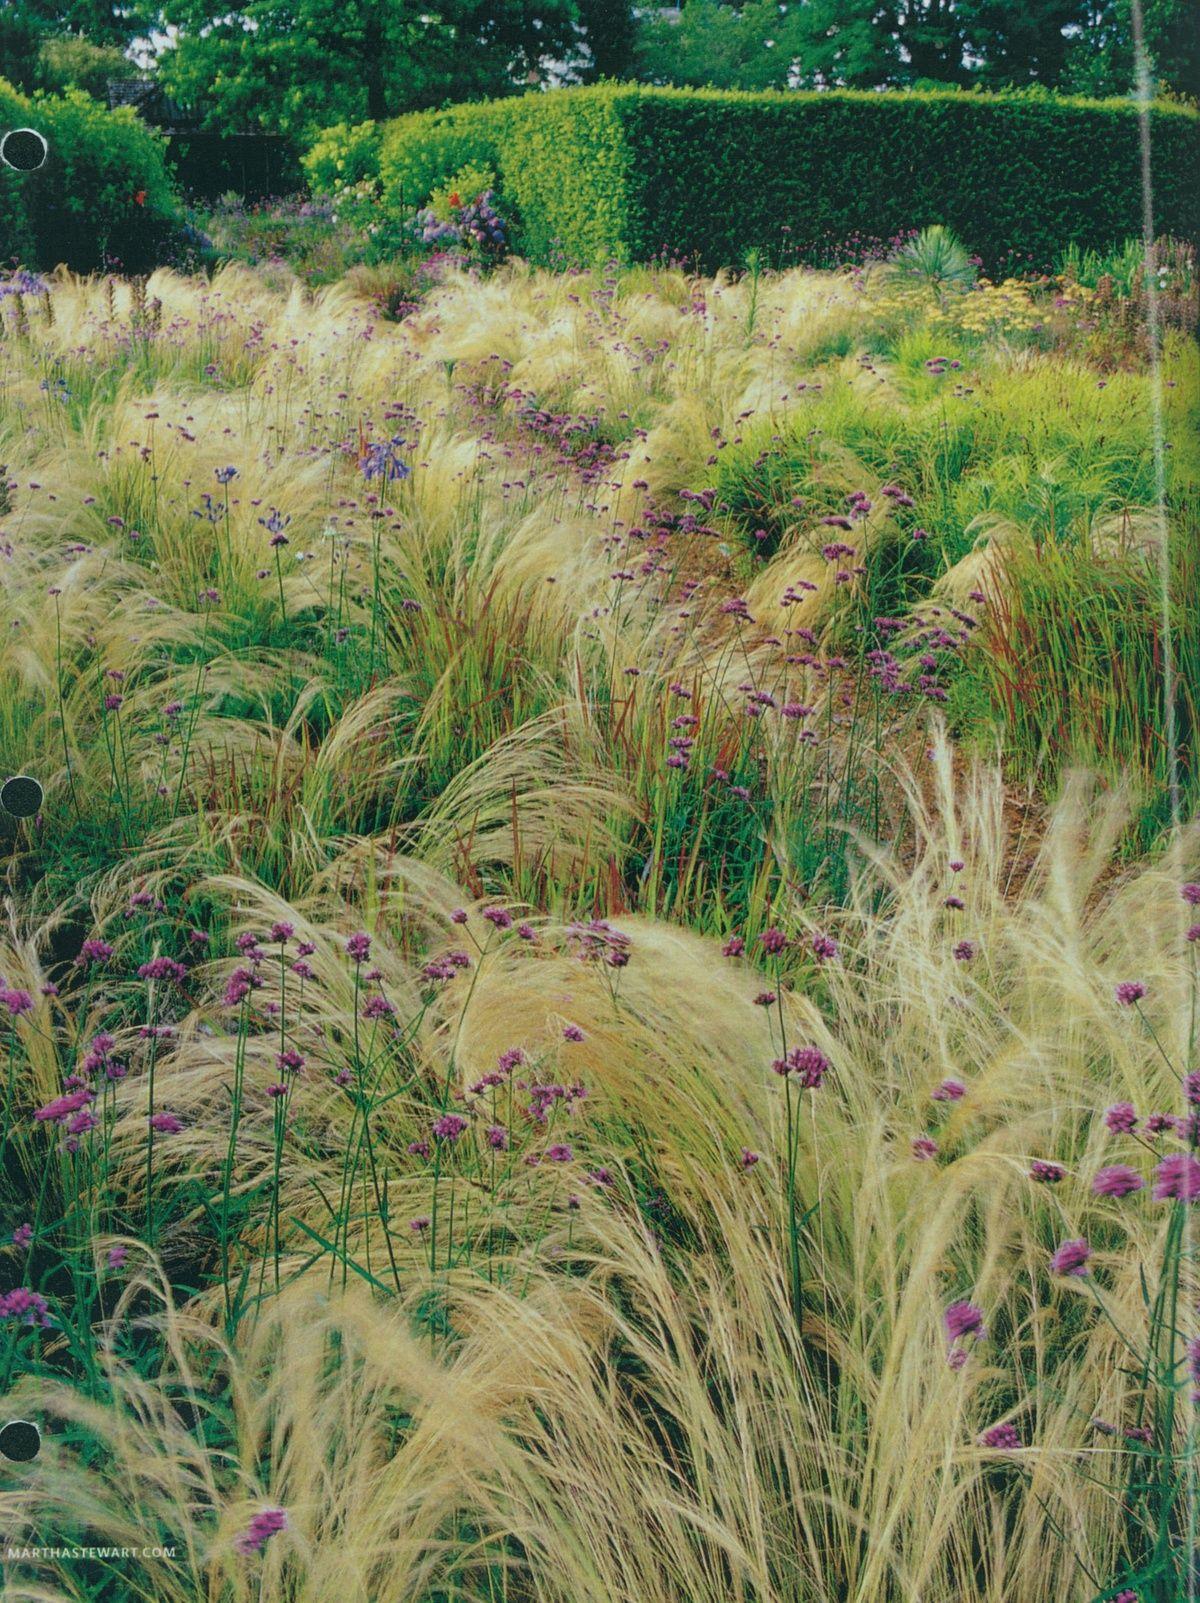 F8ef223a4526a4cd7352373c5685c821 Jpg 1 200 1 603 Pixels Prairie Garden Ornamental Grasses Dry Garden